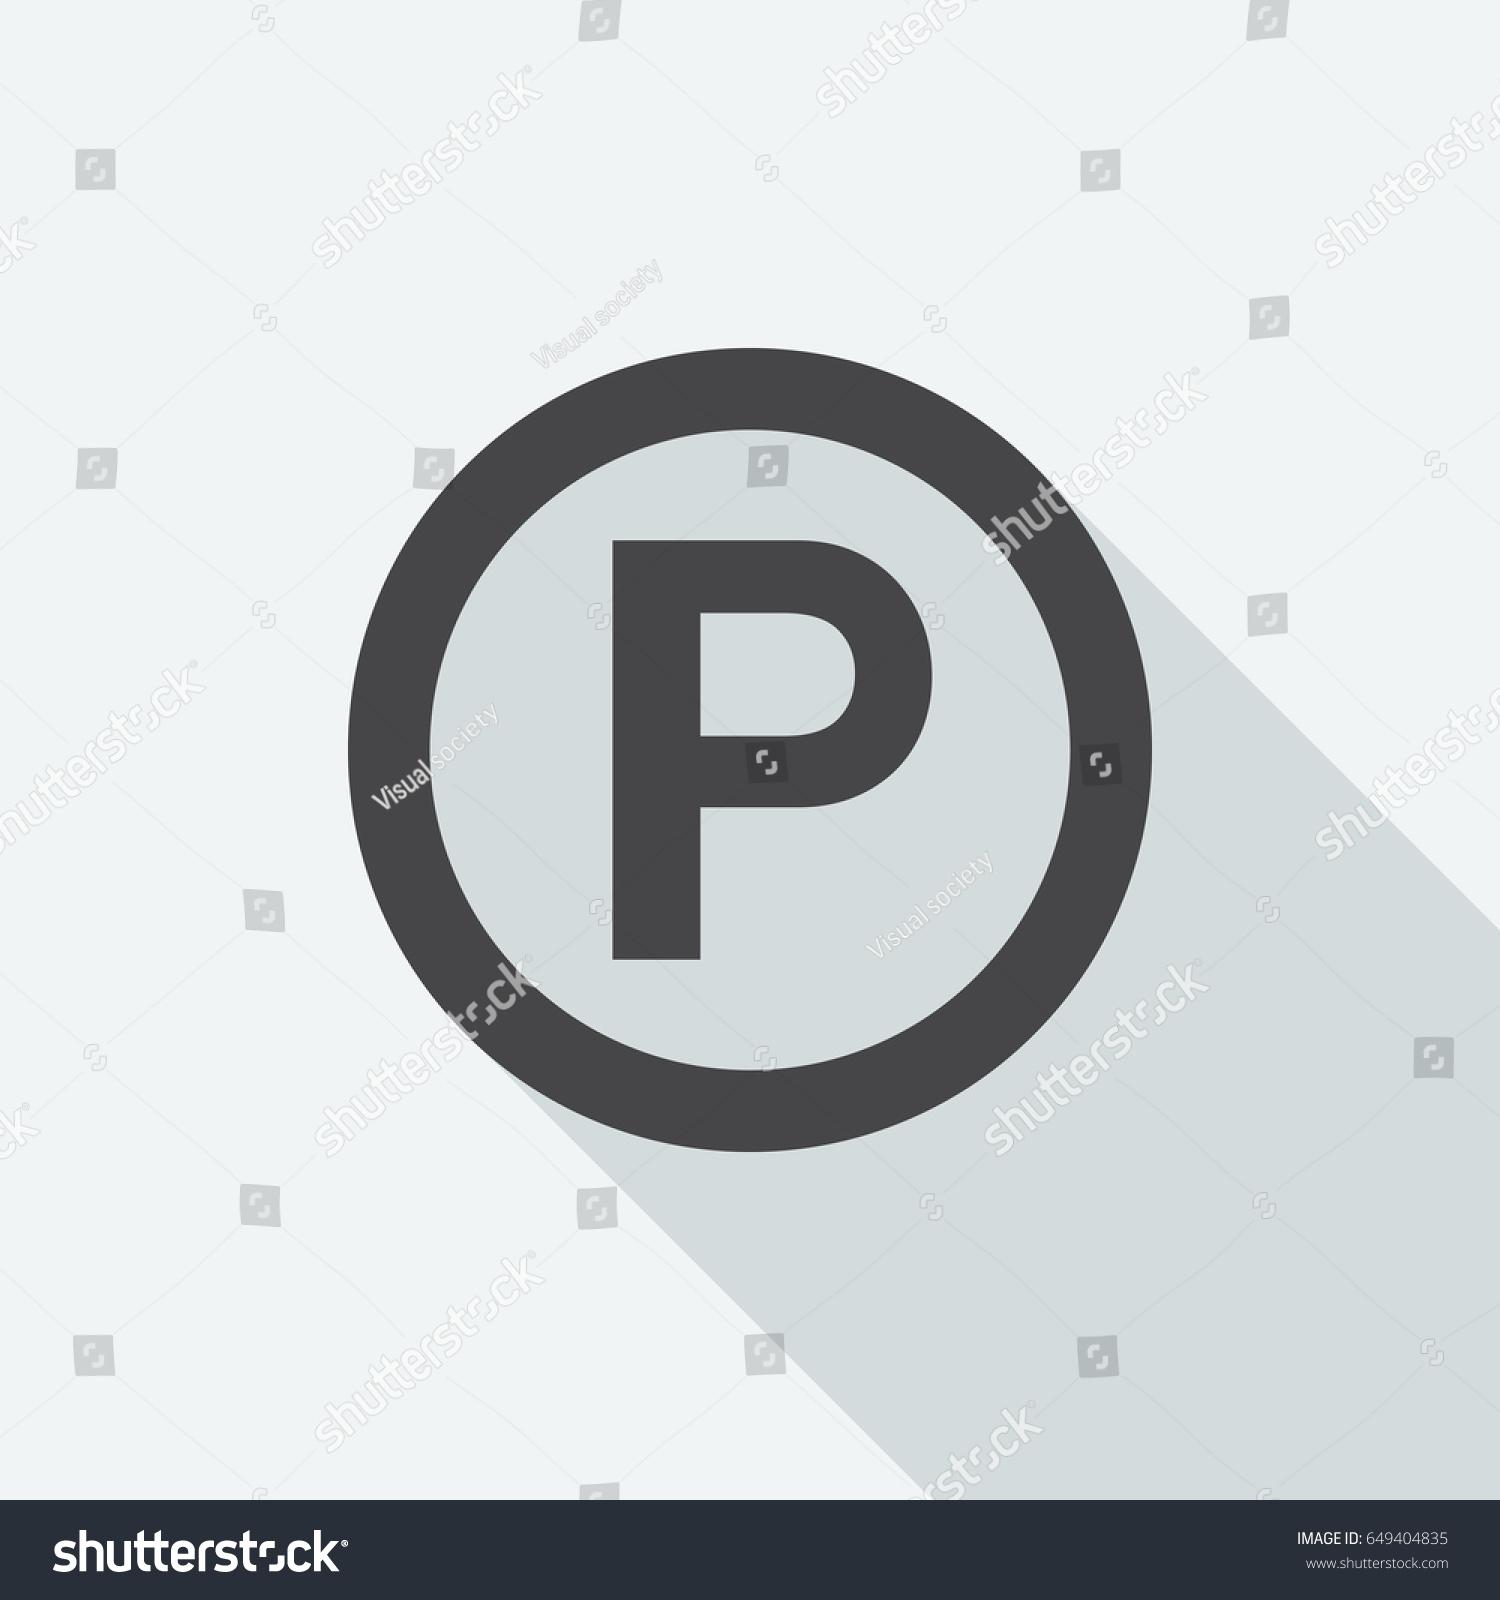 P Sound Recording Copyright Symbol Long Stock Vector Royalty Free